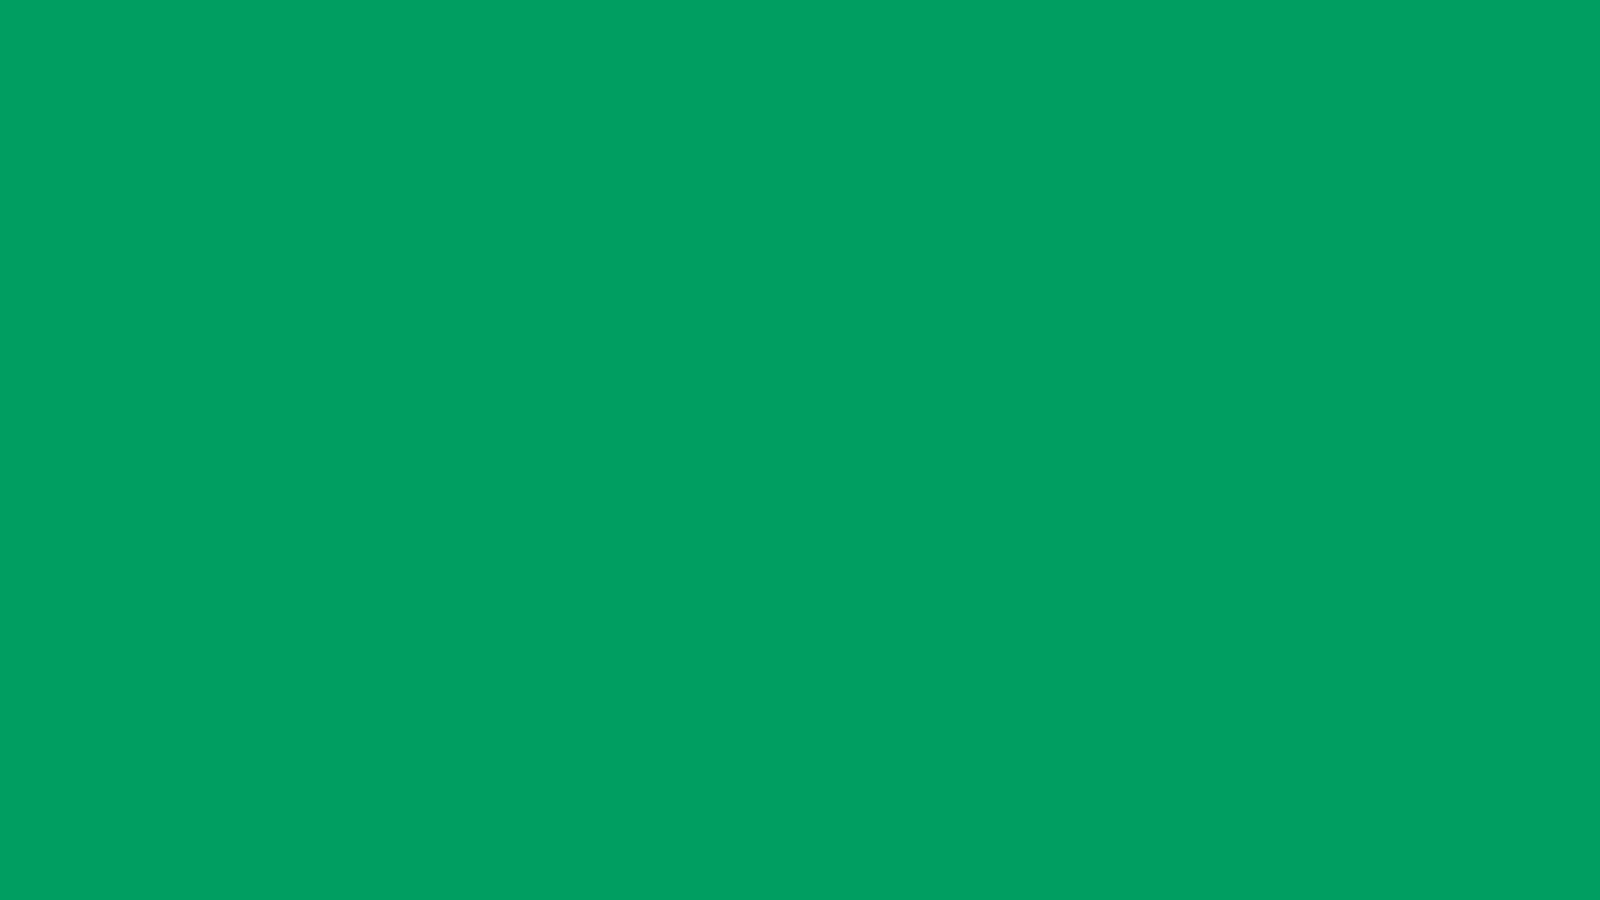 1600x900 Shamrock Green Solid Color Background